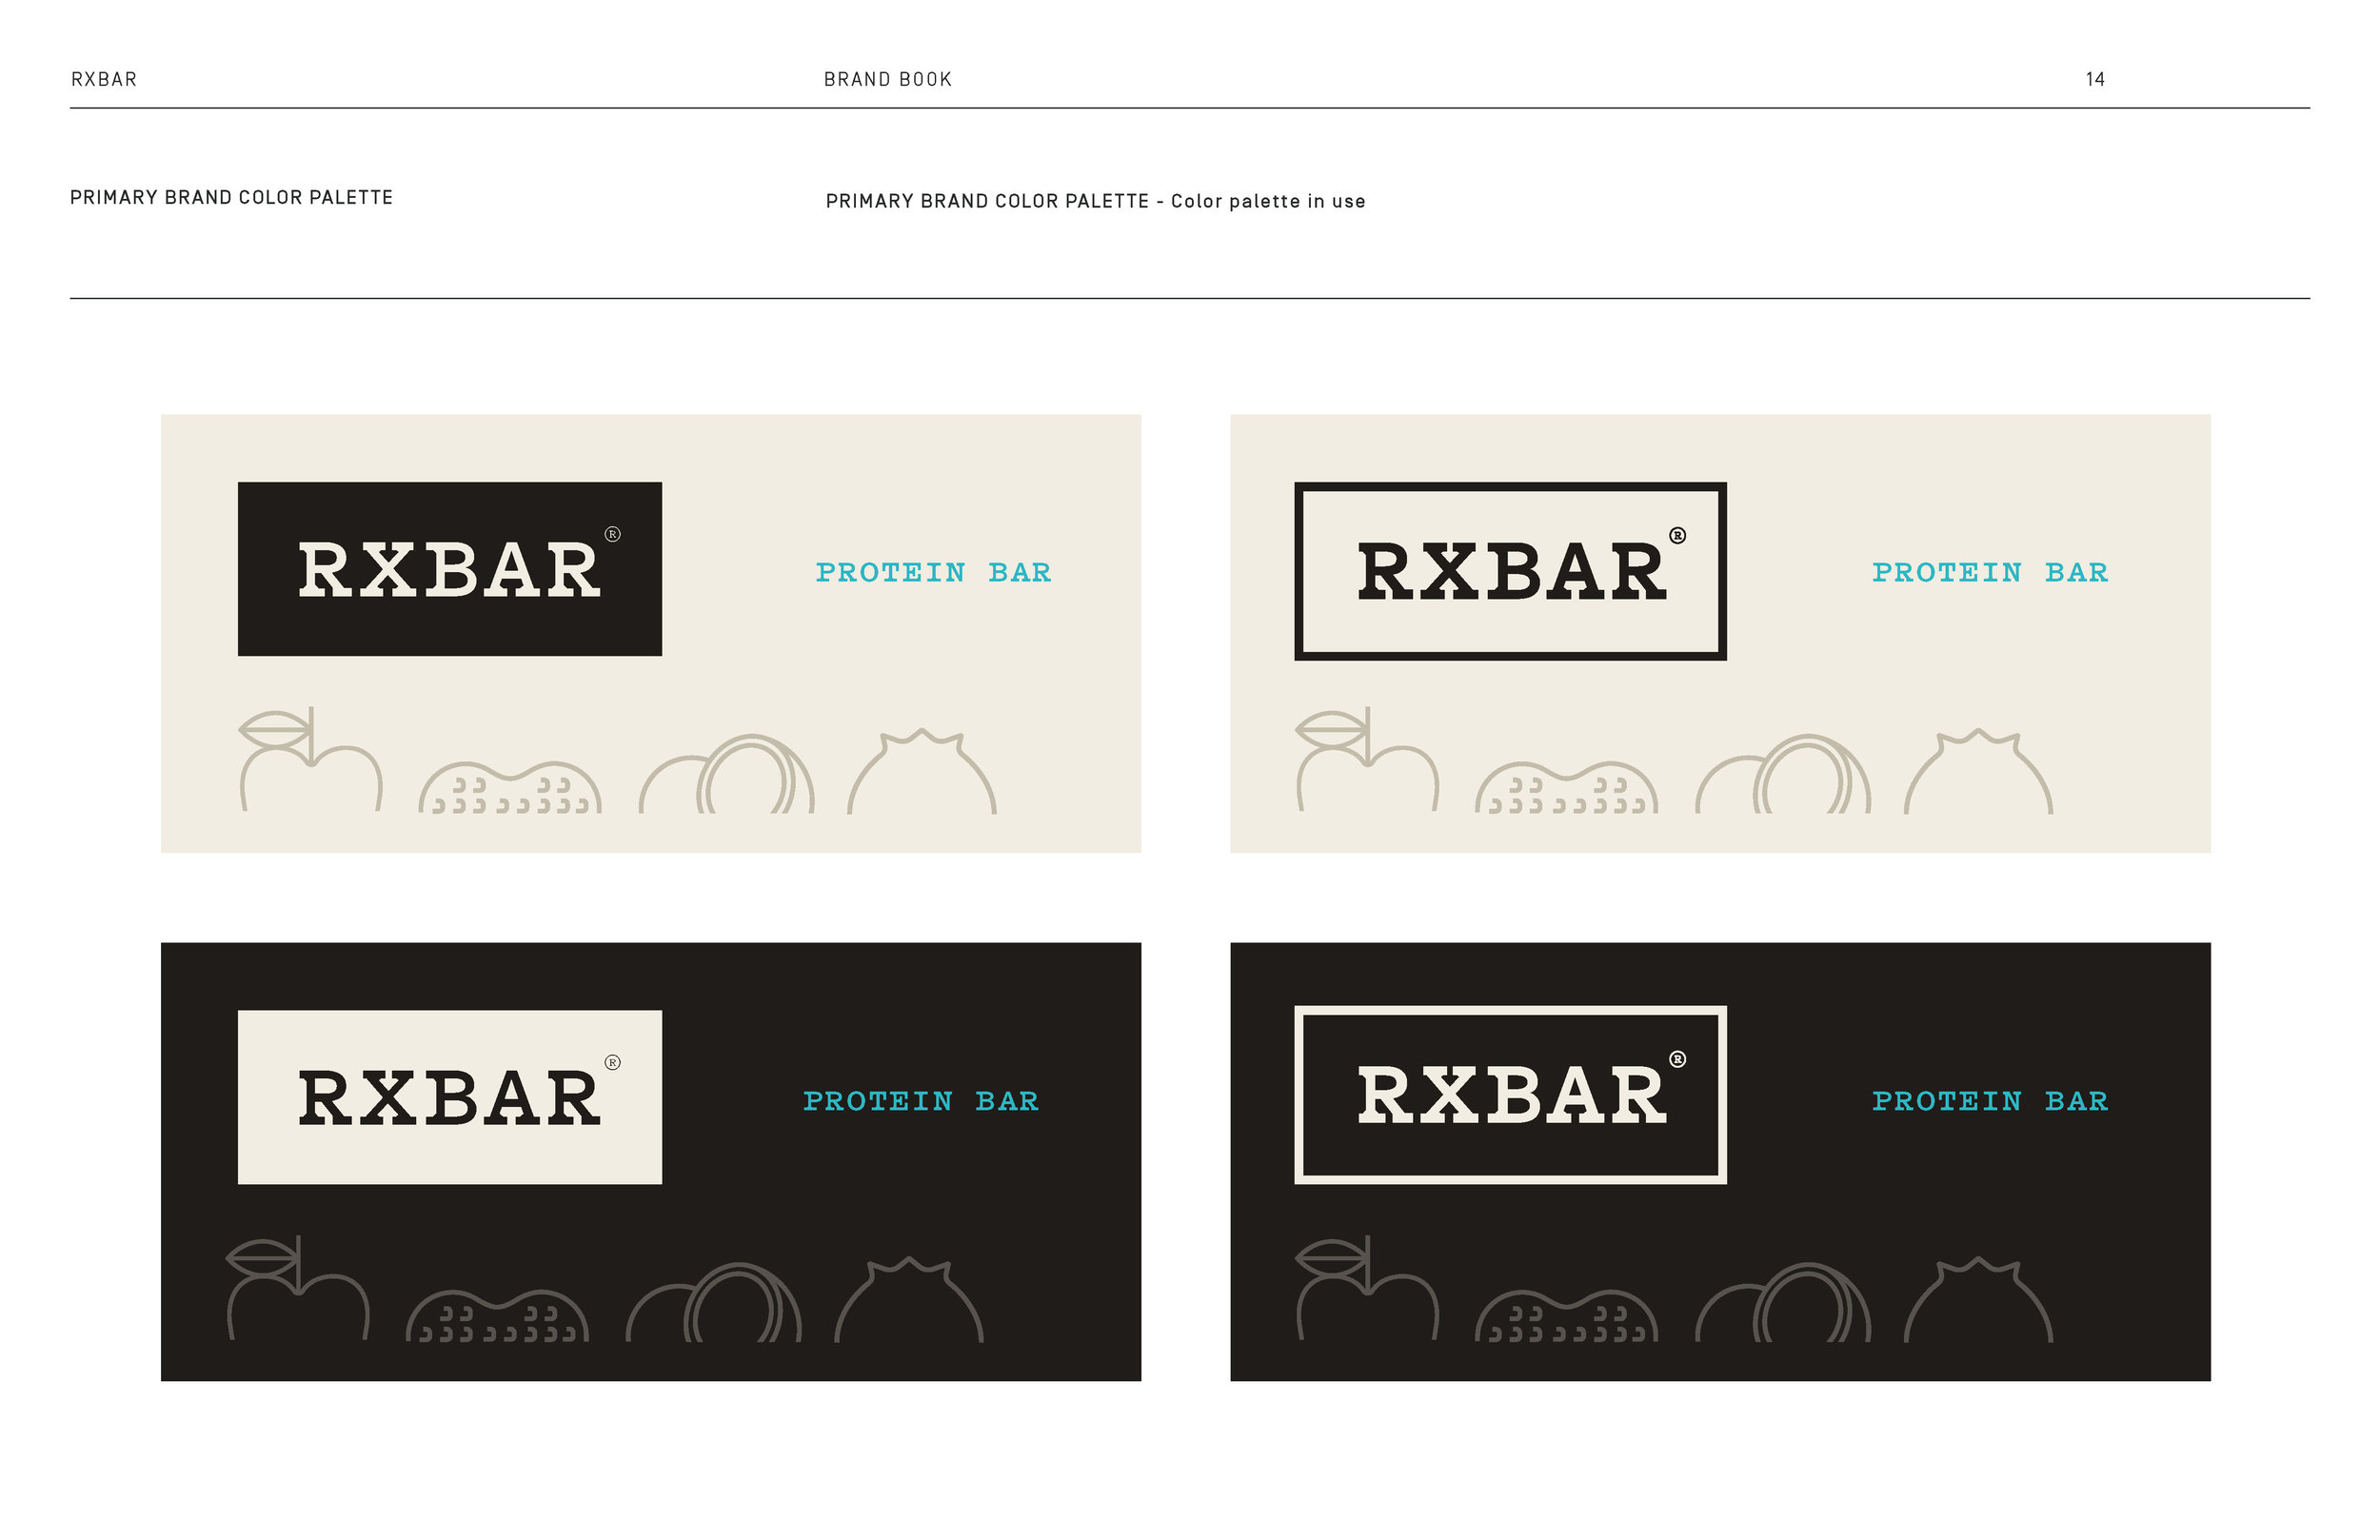 RXBAR_Brand guide_mwf_Page_14.jpg